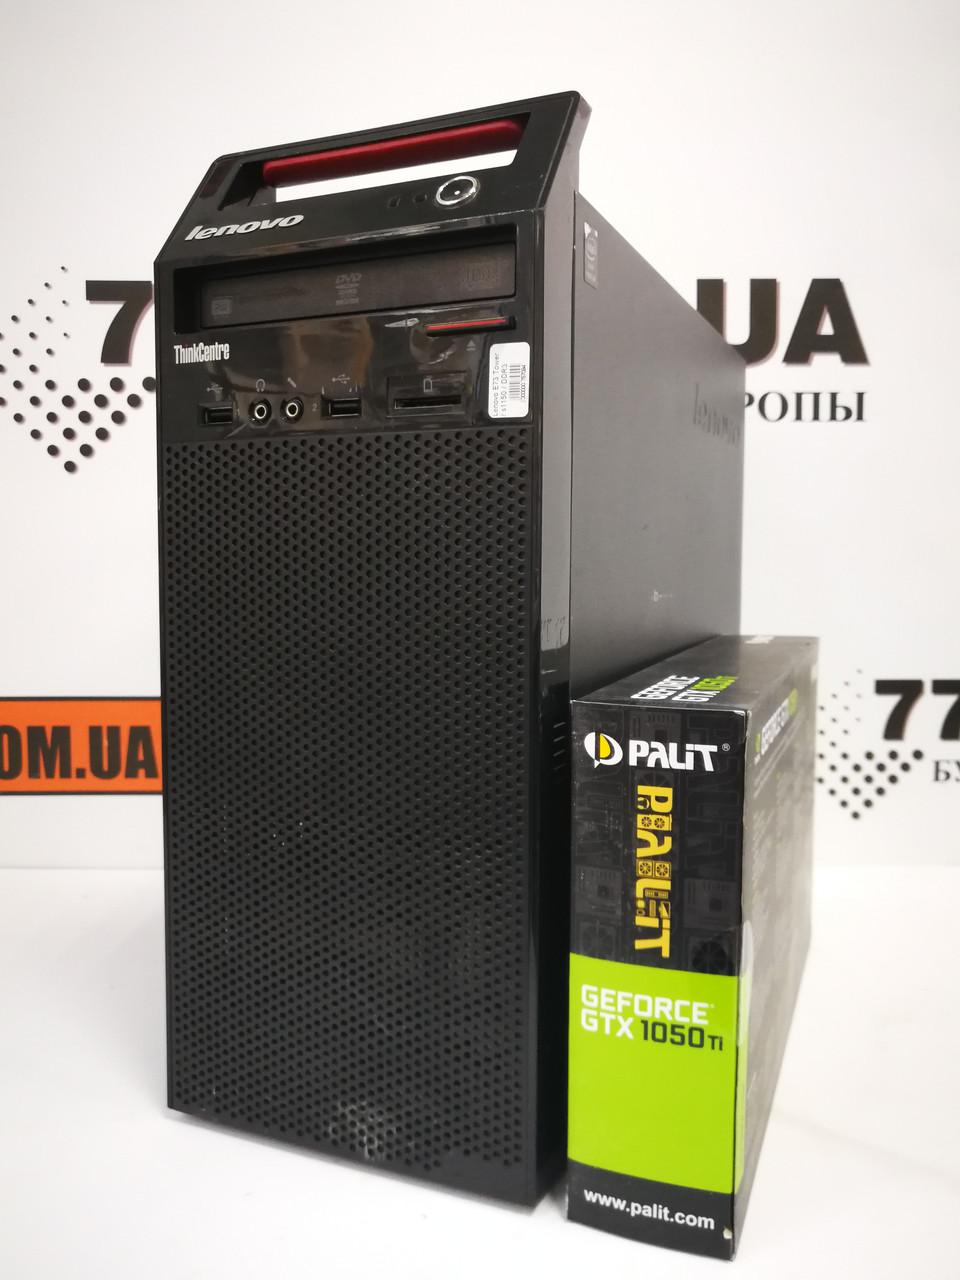 Компьютер Lenovo (Tower), Intel Core i5-4570 3.6GHz, RAM 8ГБ, SSD 120GB + HDD 500ГБ, GeForce GTX 1050Ti 4ГБ